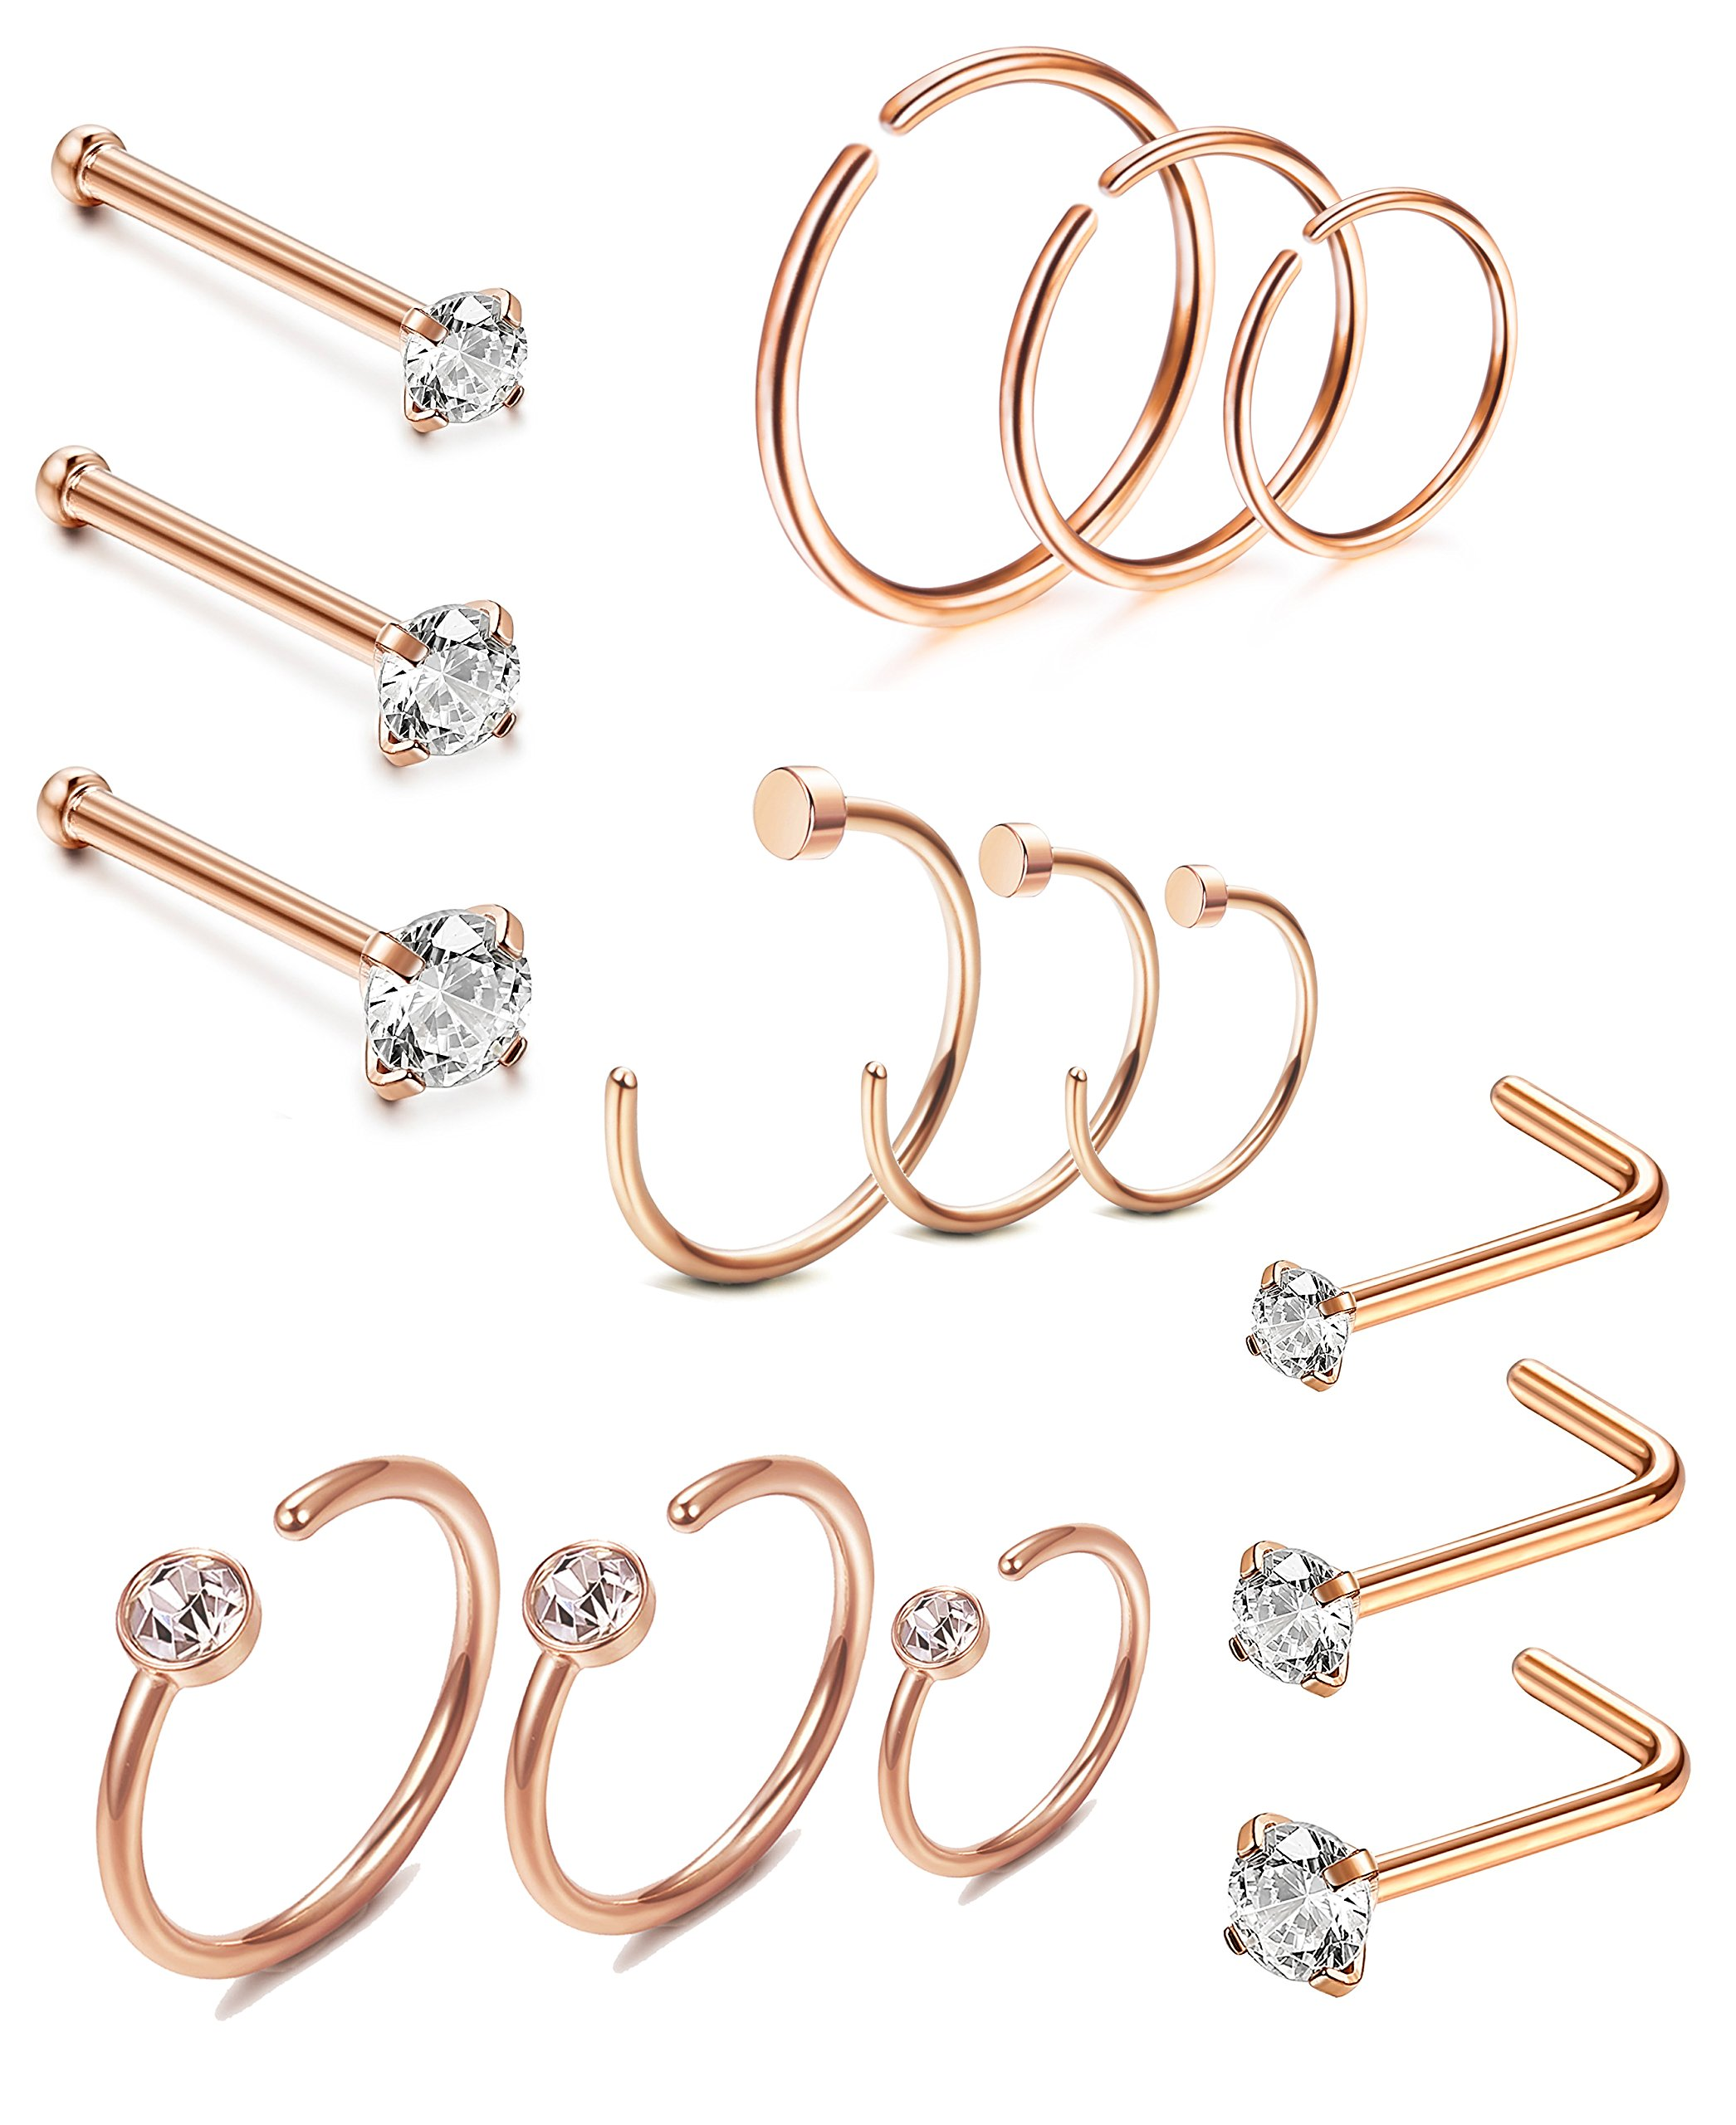 Thunaraz 15PCS Stainless Steel Nose Ring CZ L-shaped Hoop Piercing For Men Women Rose Gold Tone